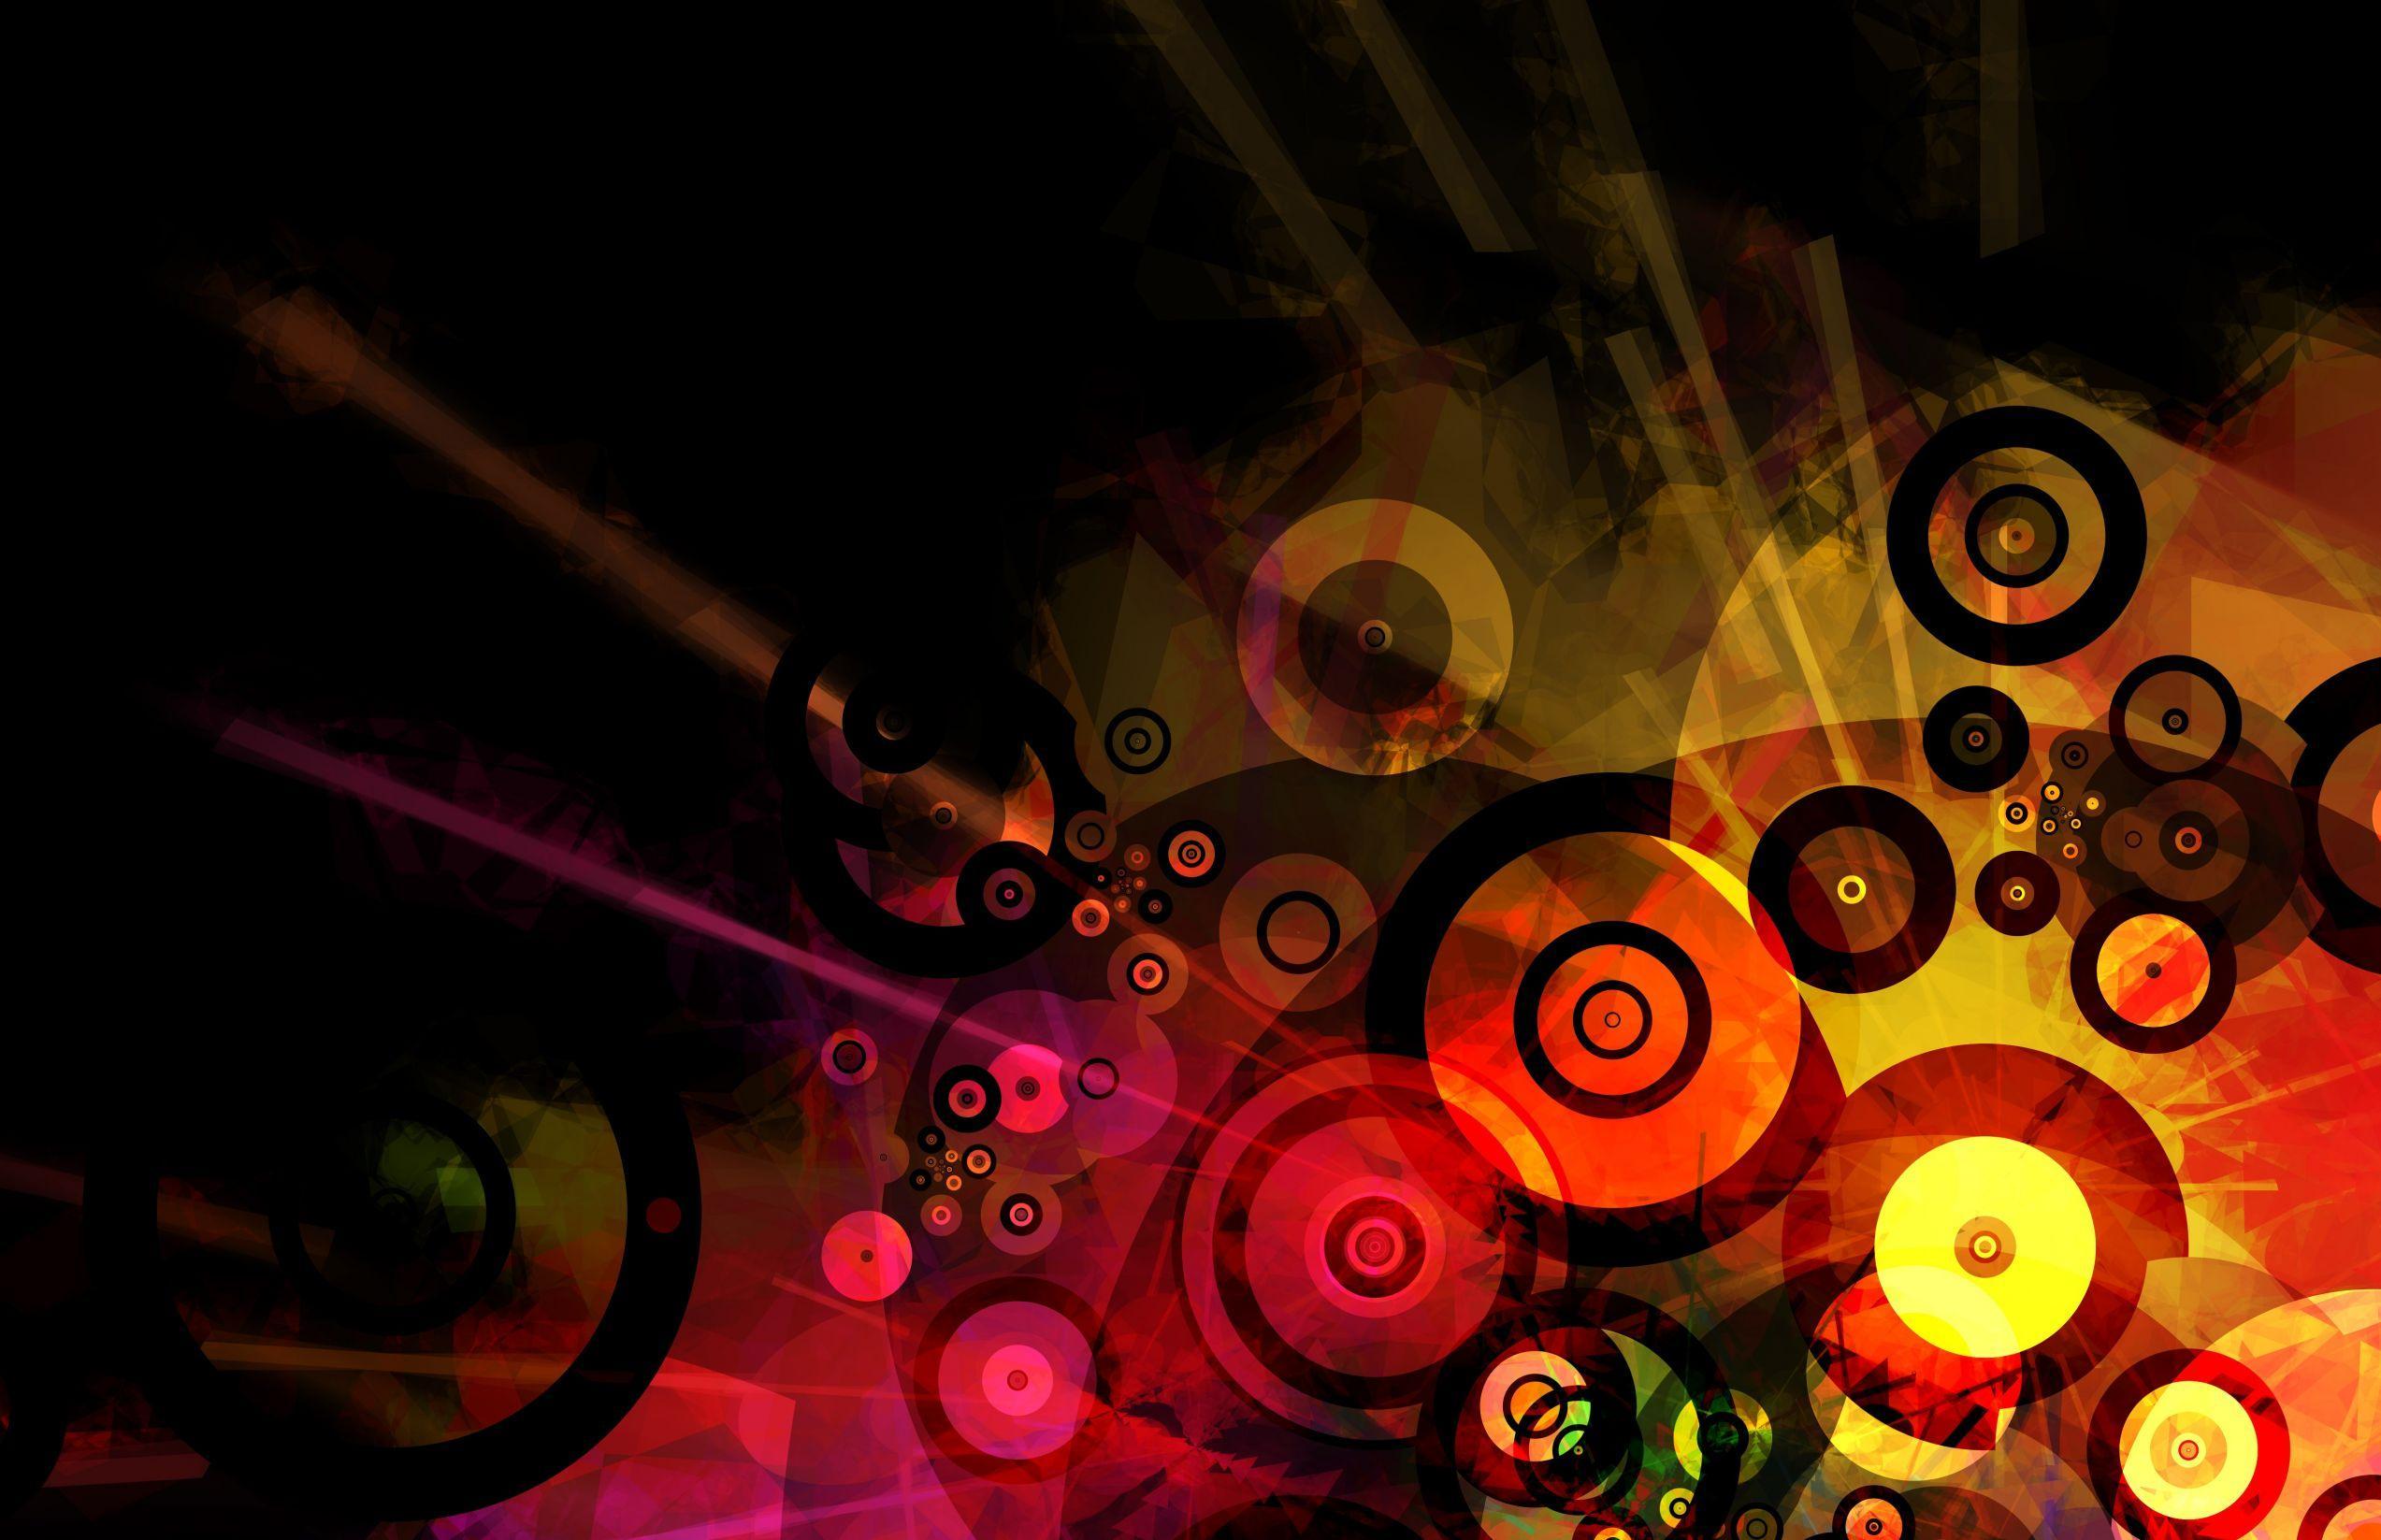 Apache2229 Unix mod ssl2229 OpenSSL098e fips rhel5 mod 2546x1647